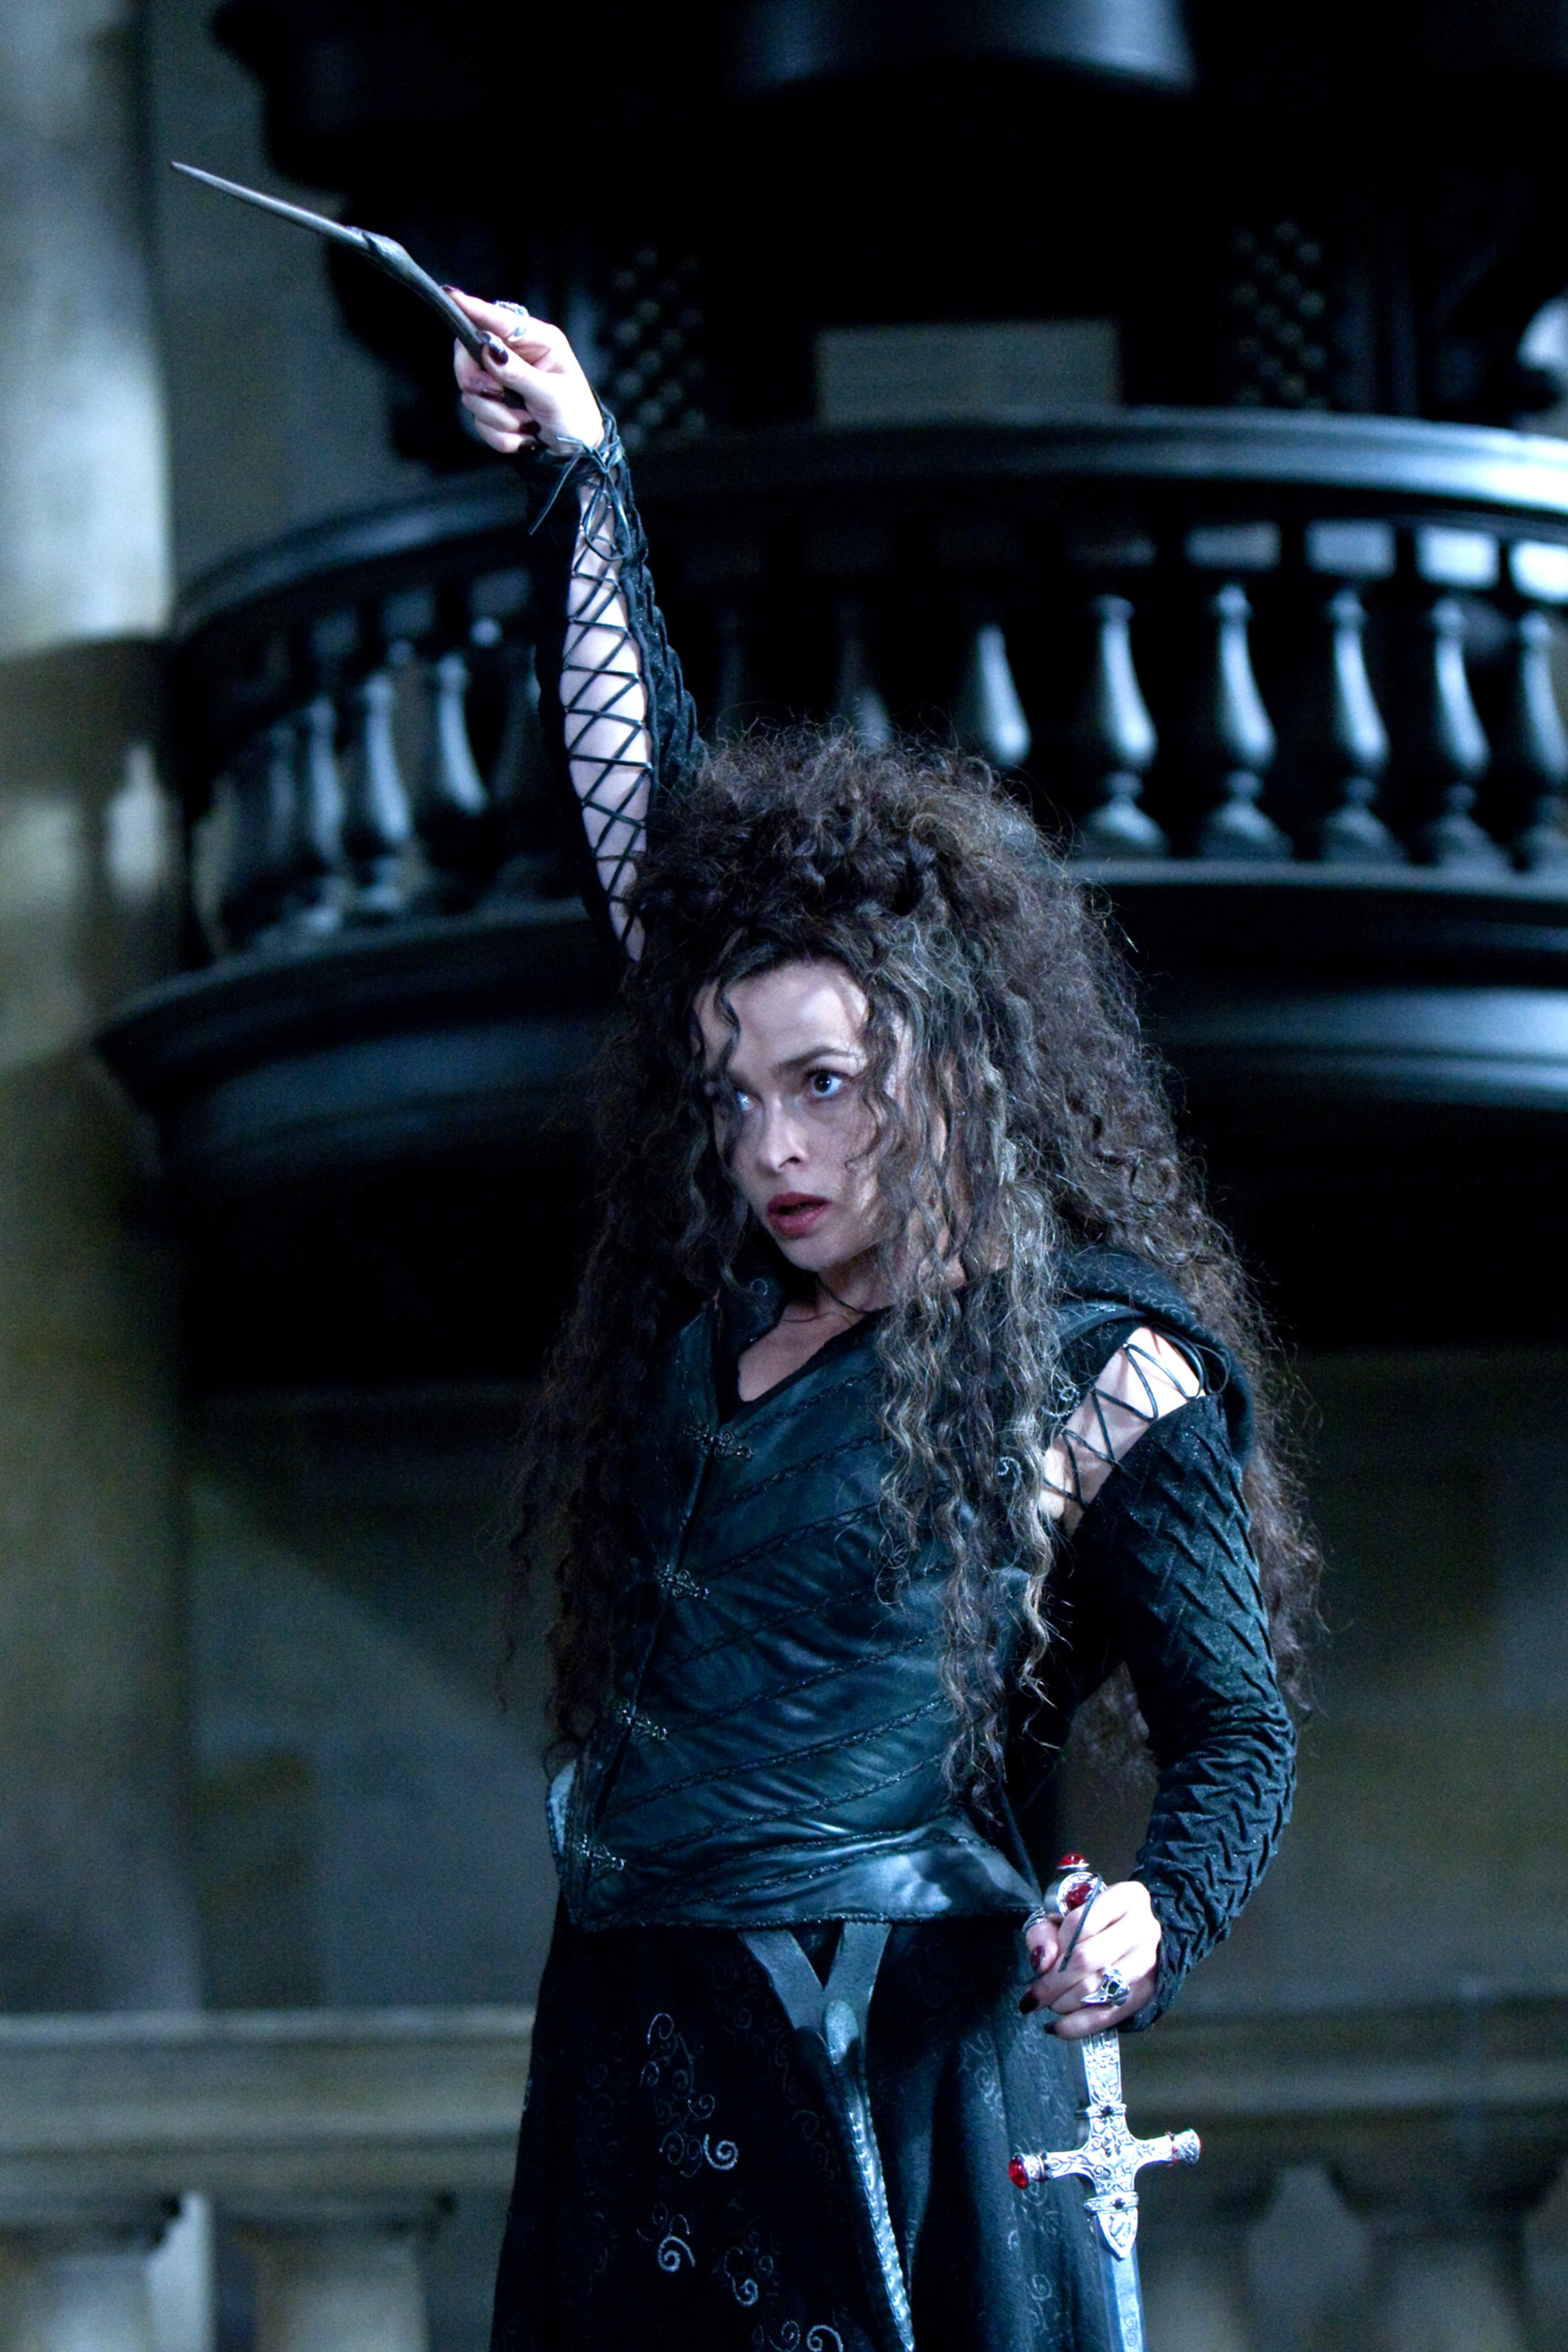 Every time Bellatrix Lestrange gave us nightmares | Wizarding World